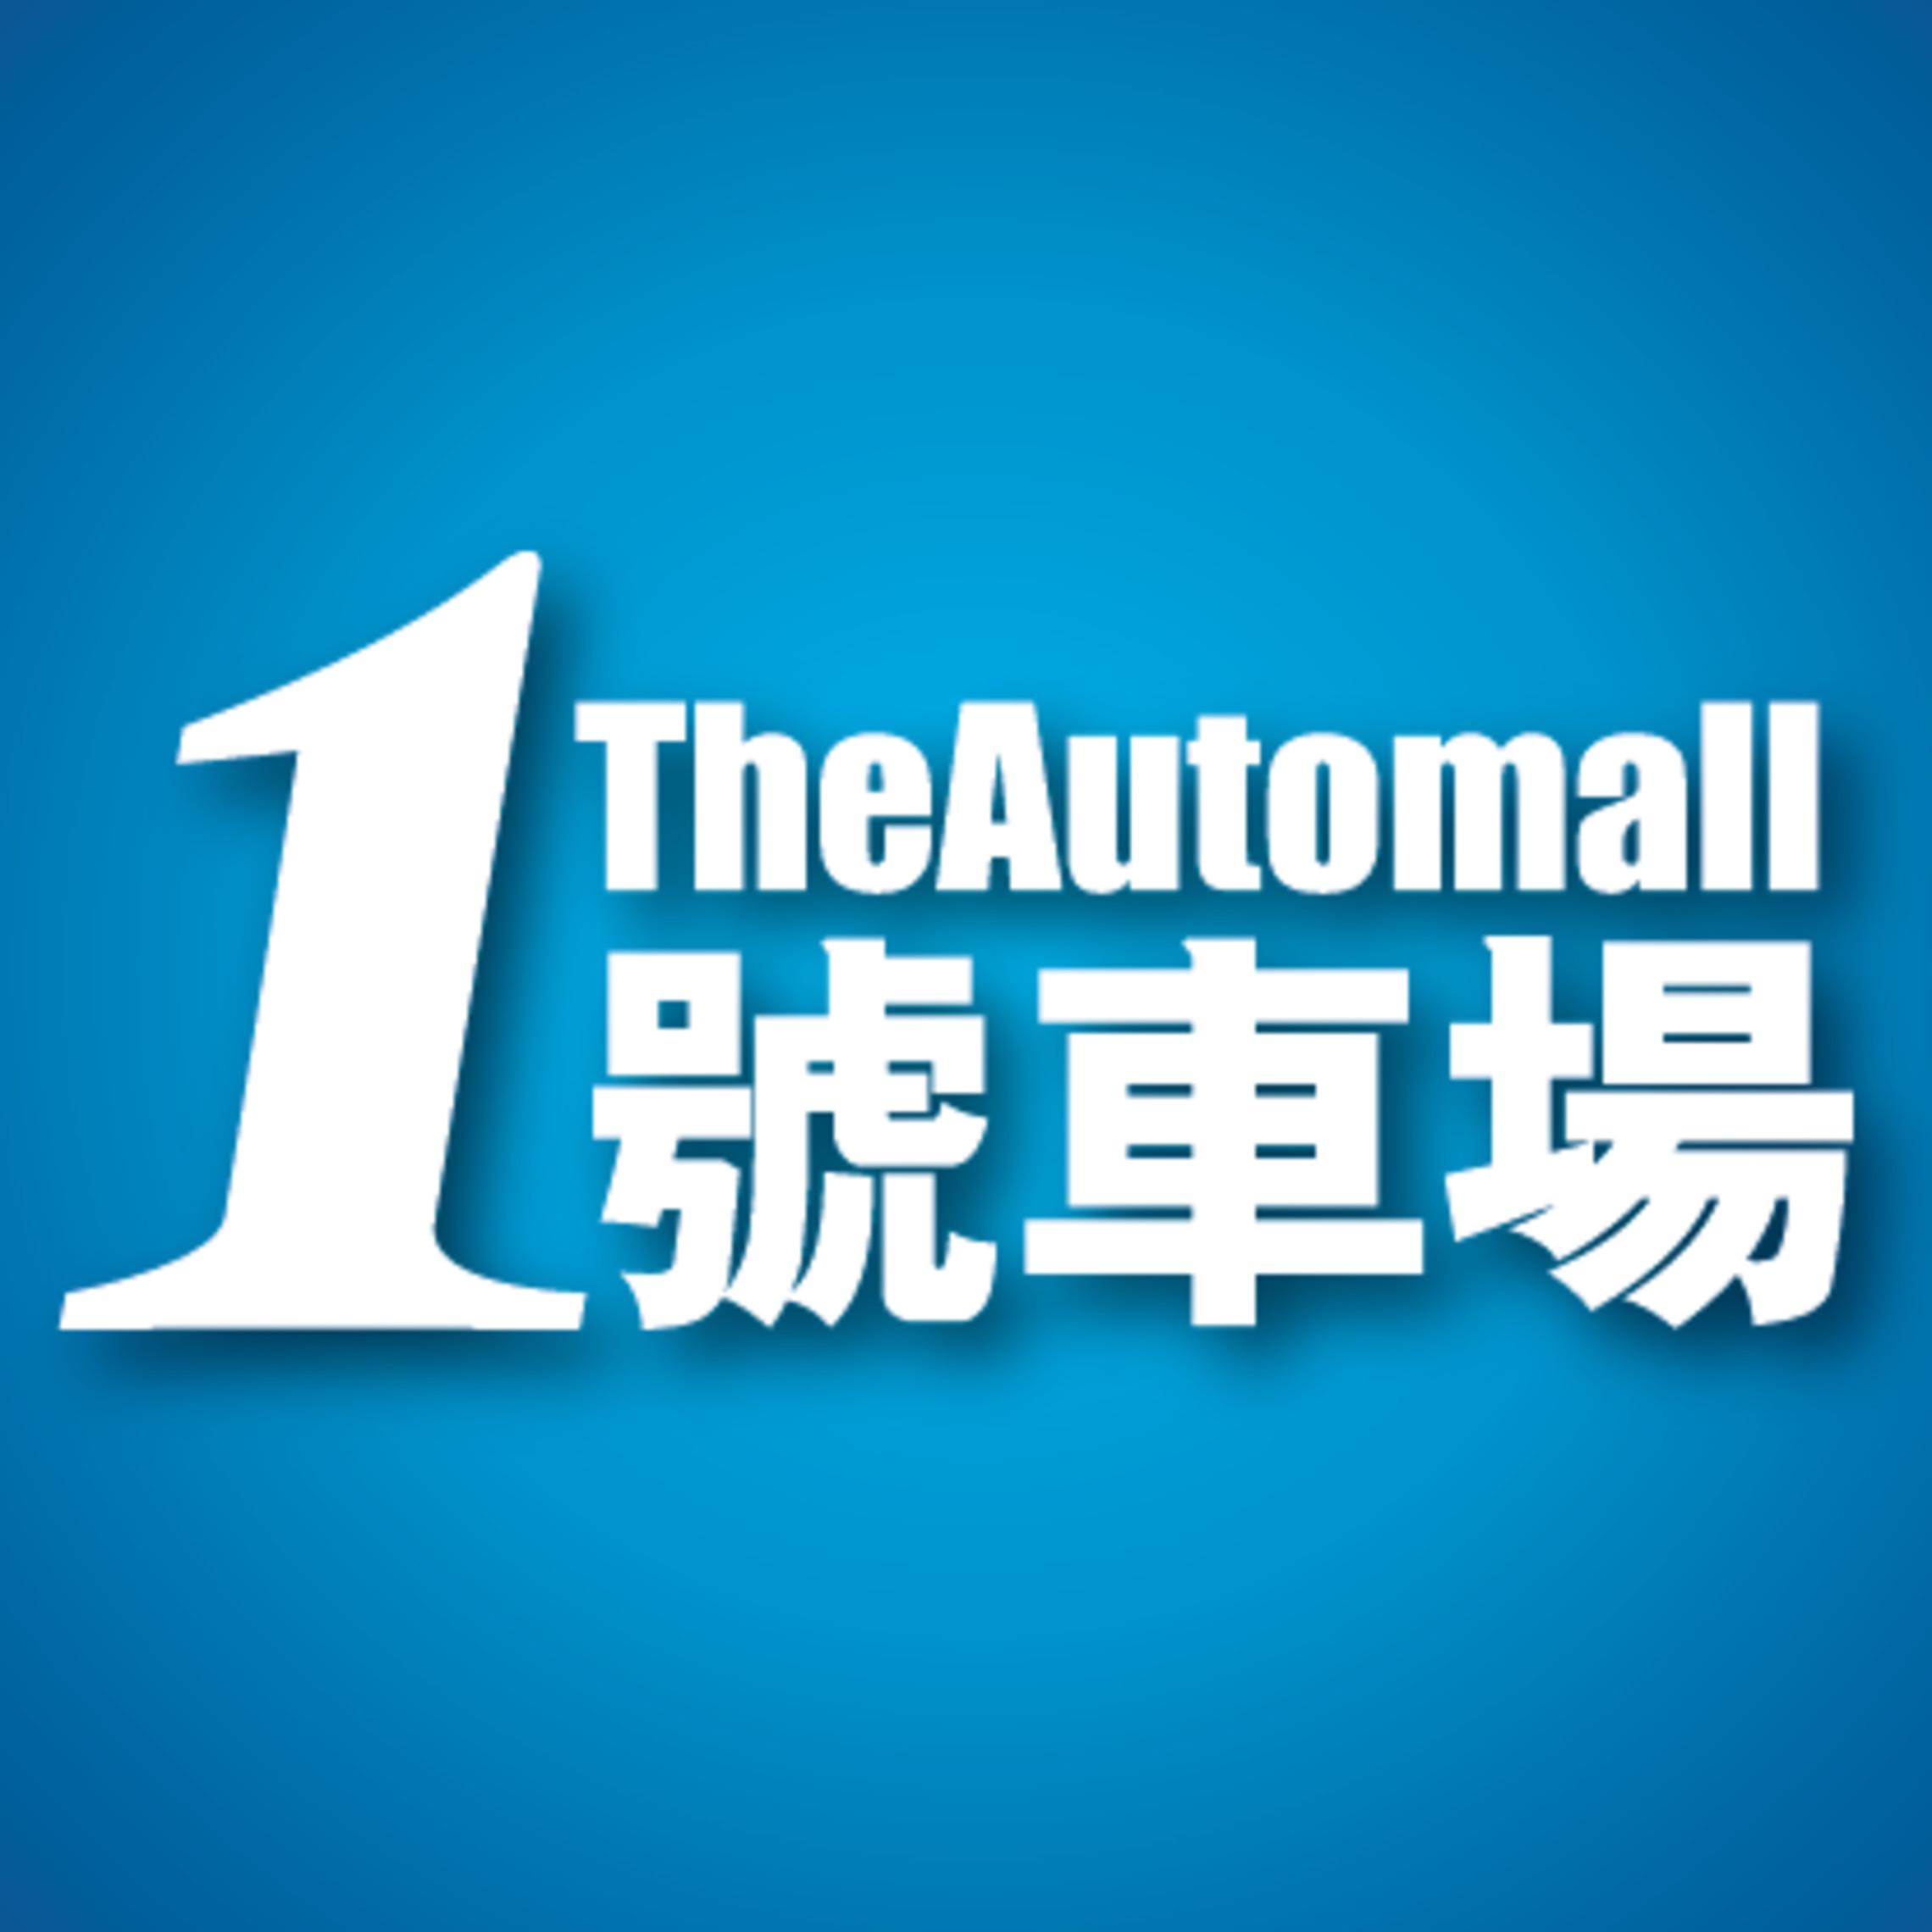 automall hong kong- company logo